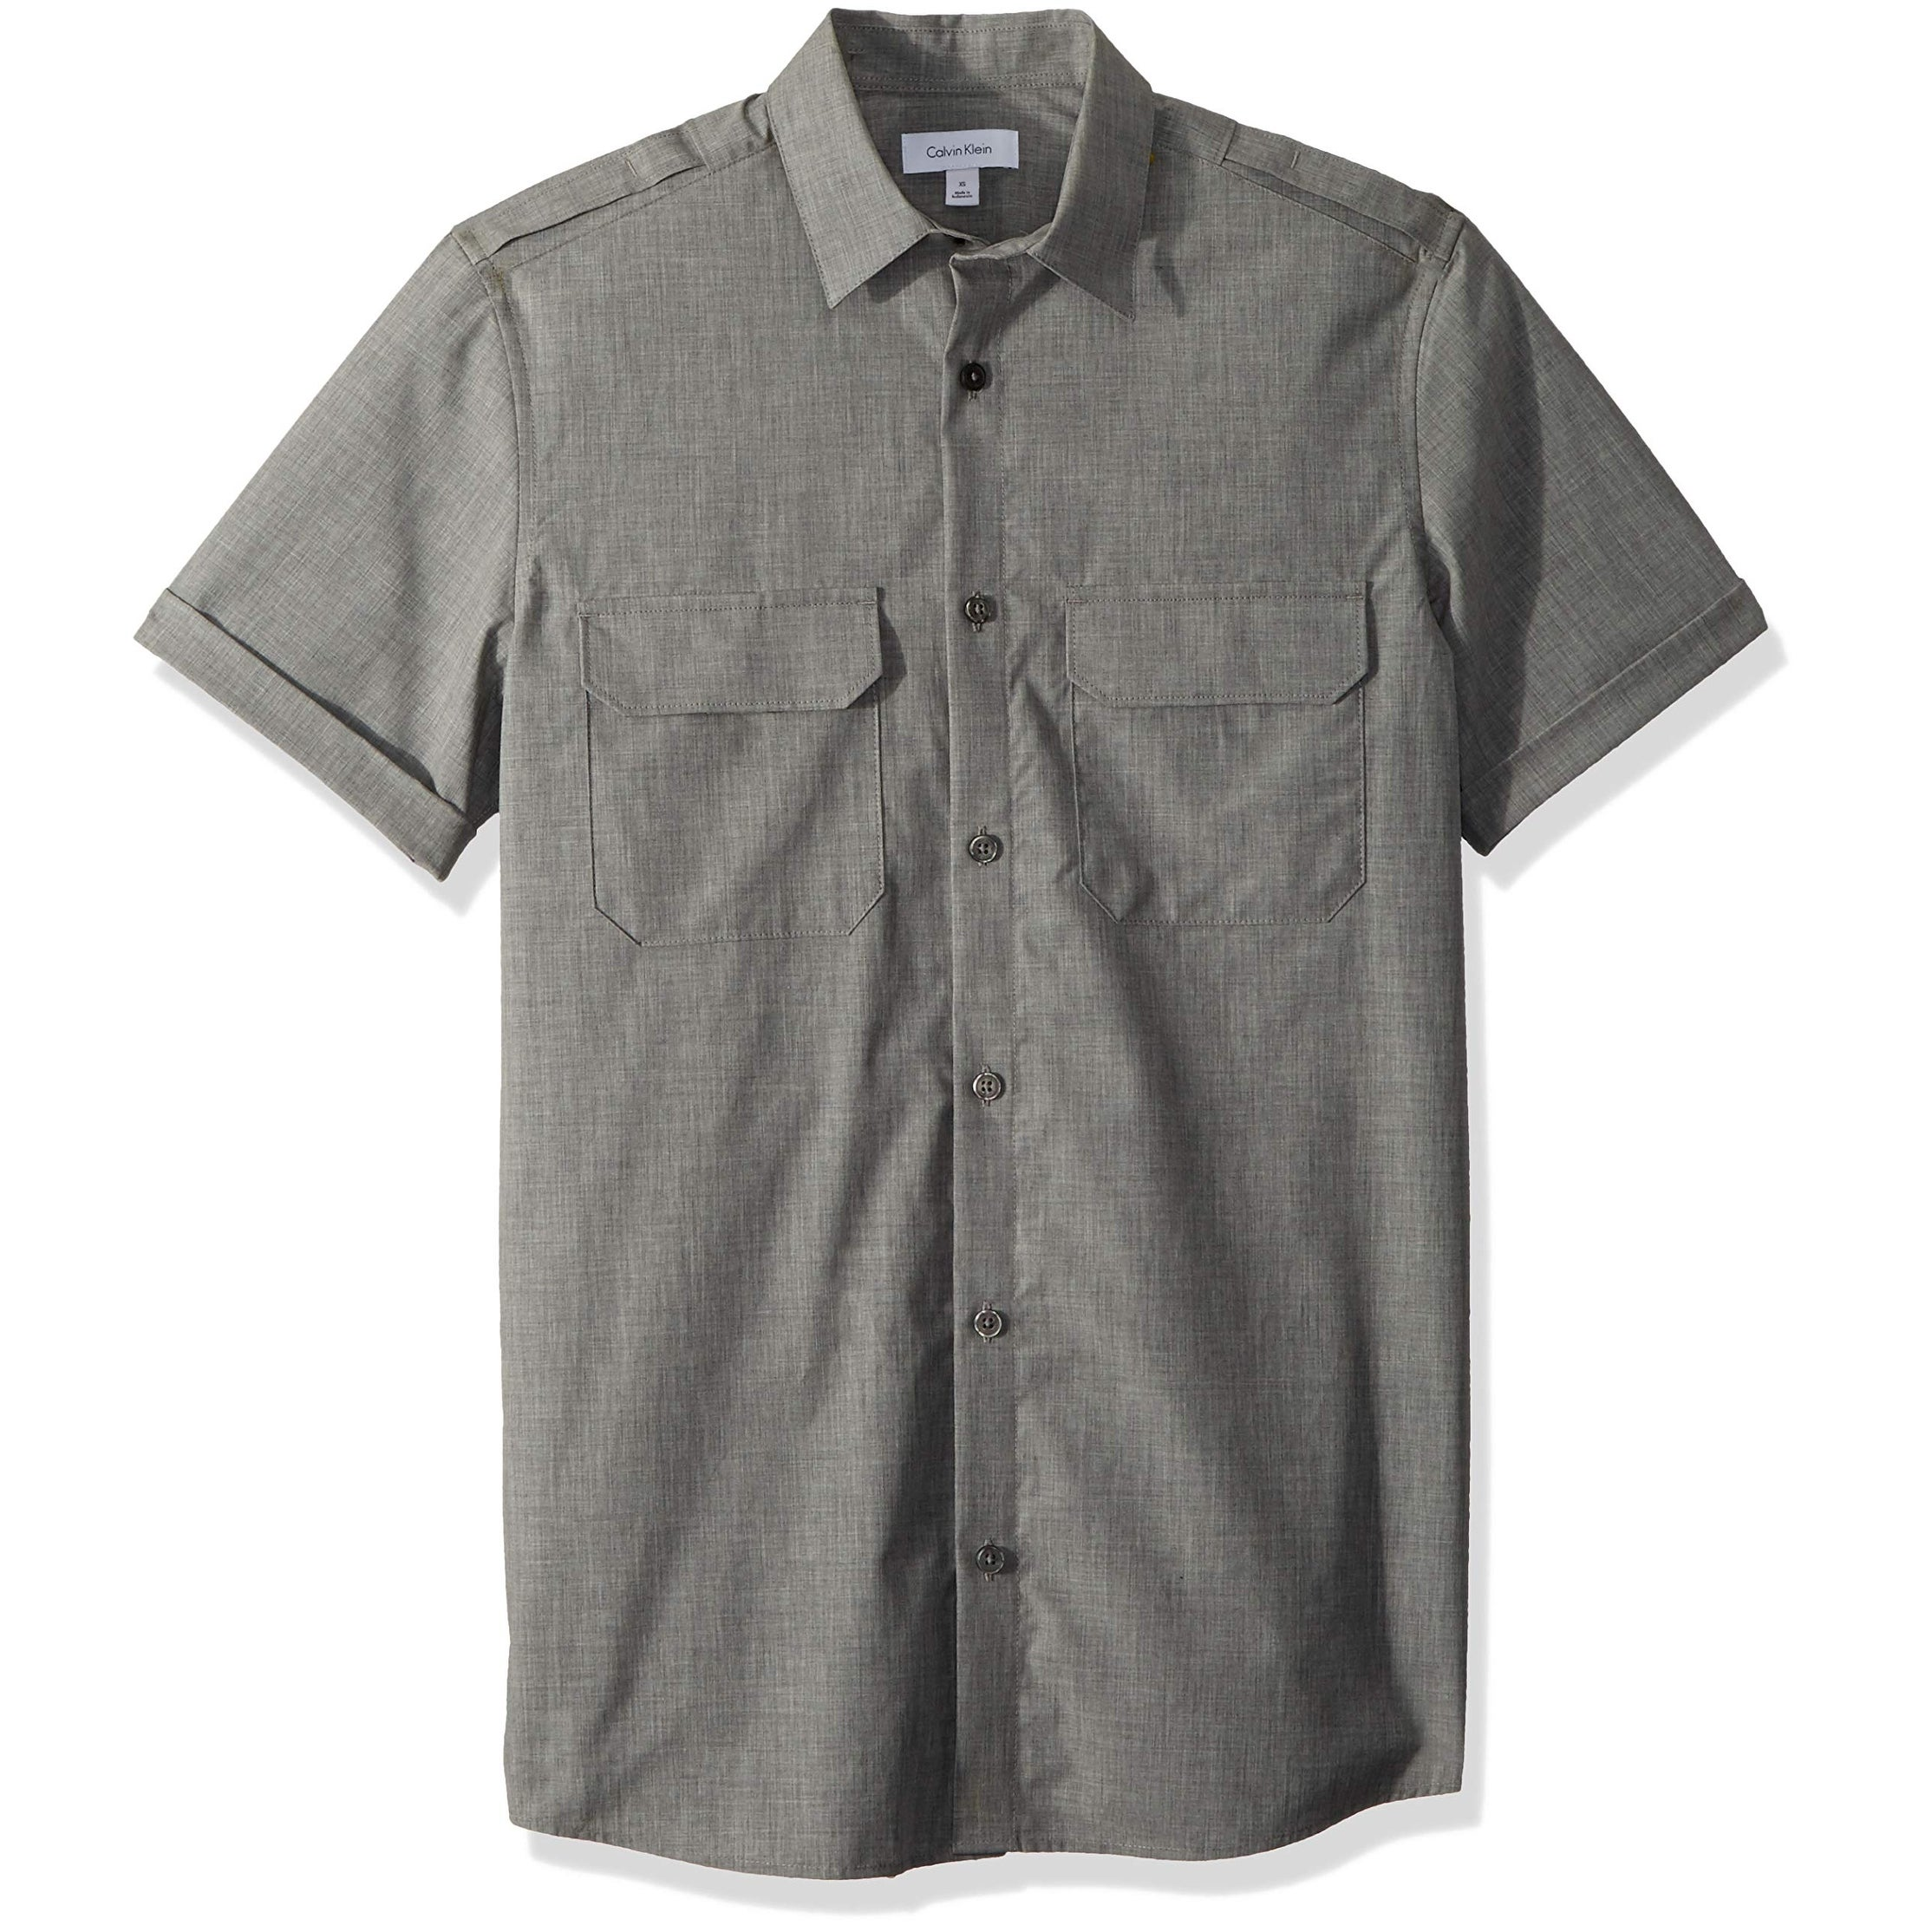 19cb05216e5c Calvin Klein Shirts